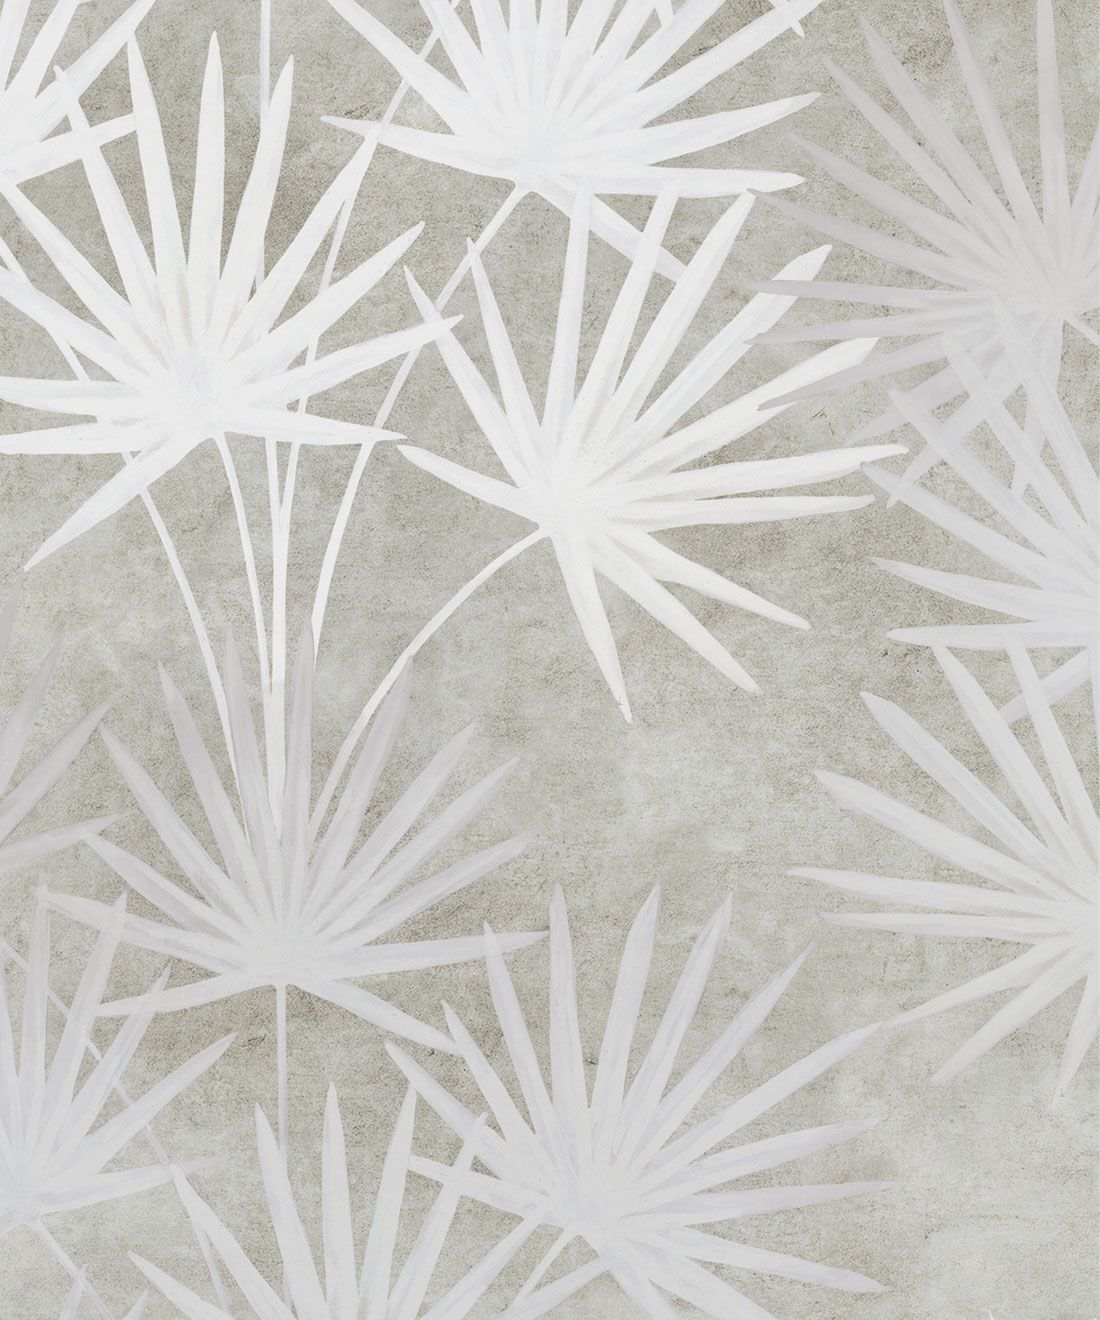 Oriental Palm Wallpaper (Two Roll Set)